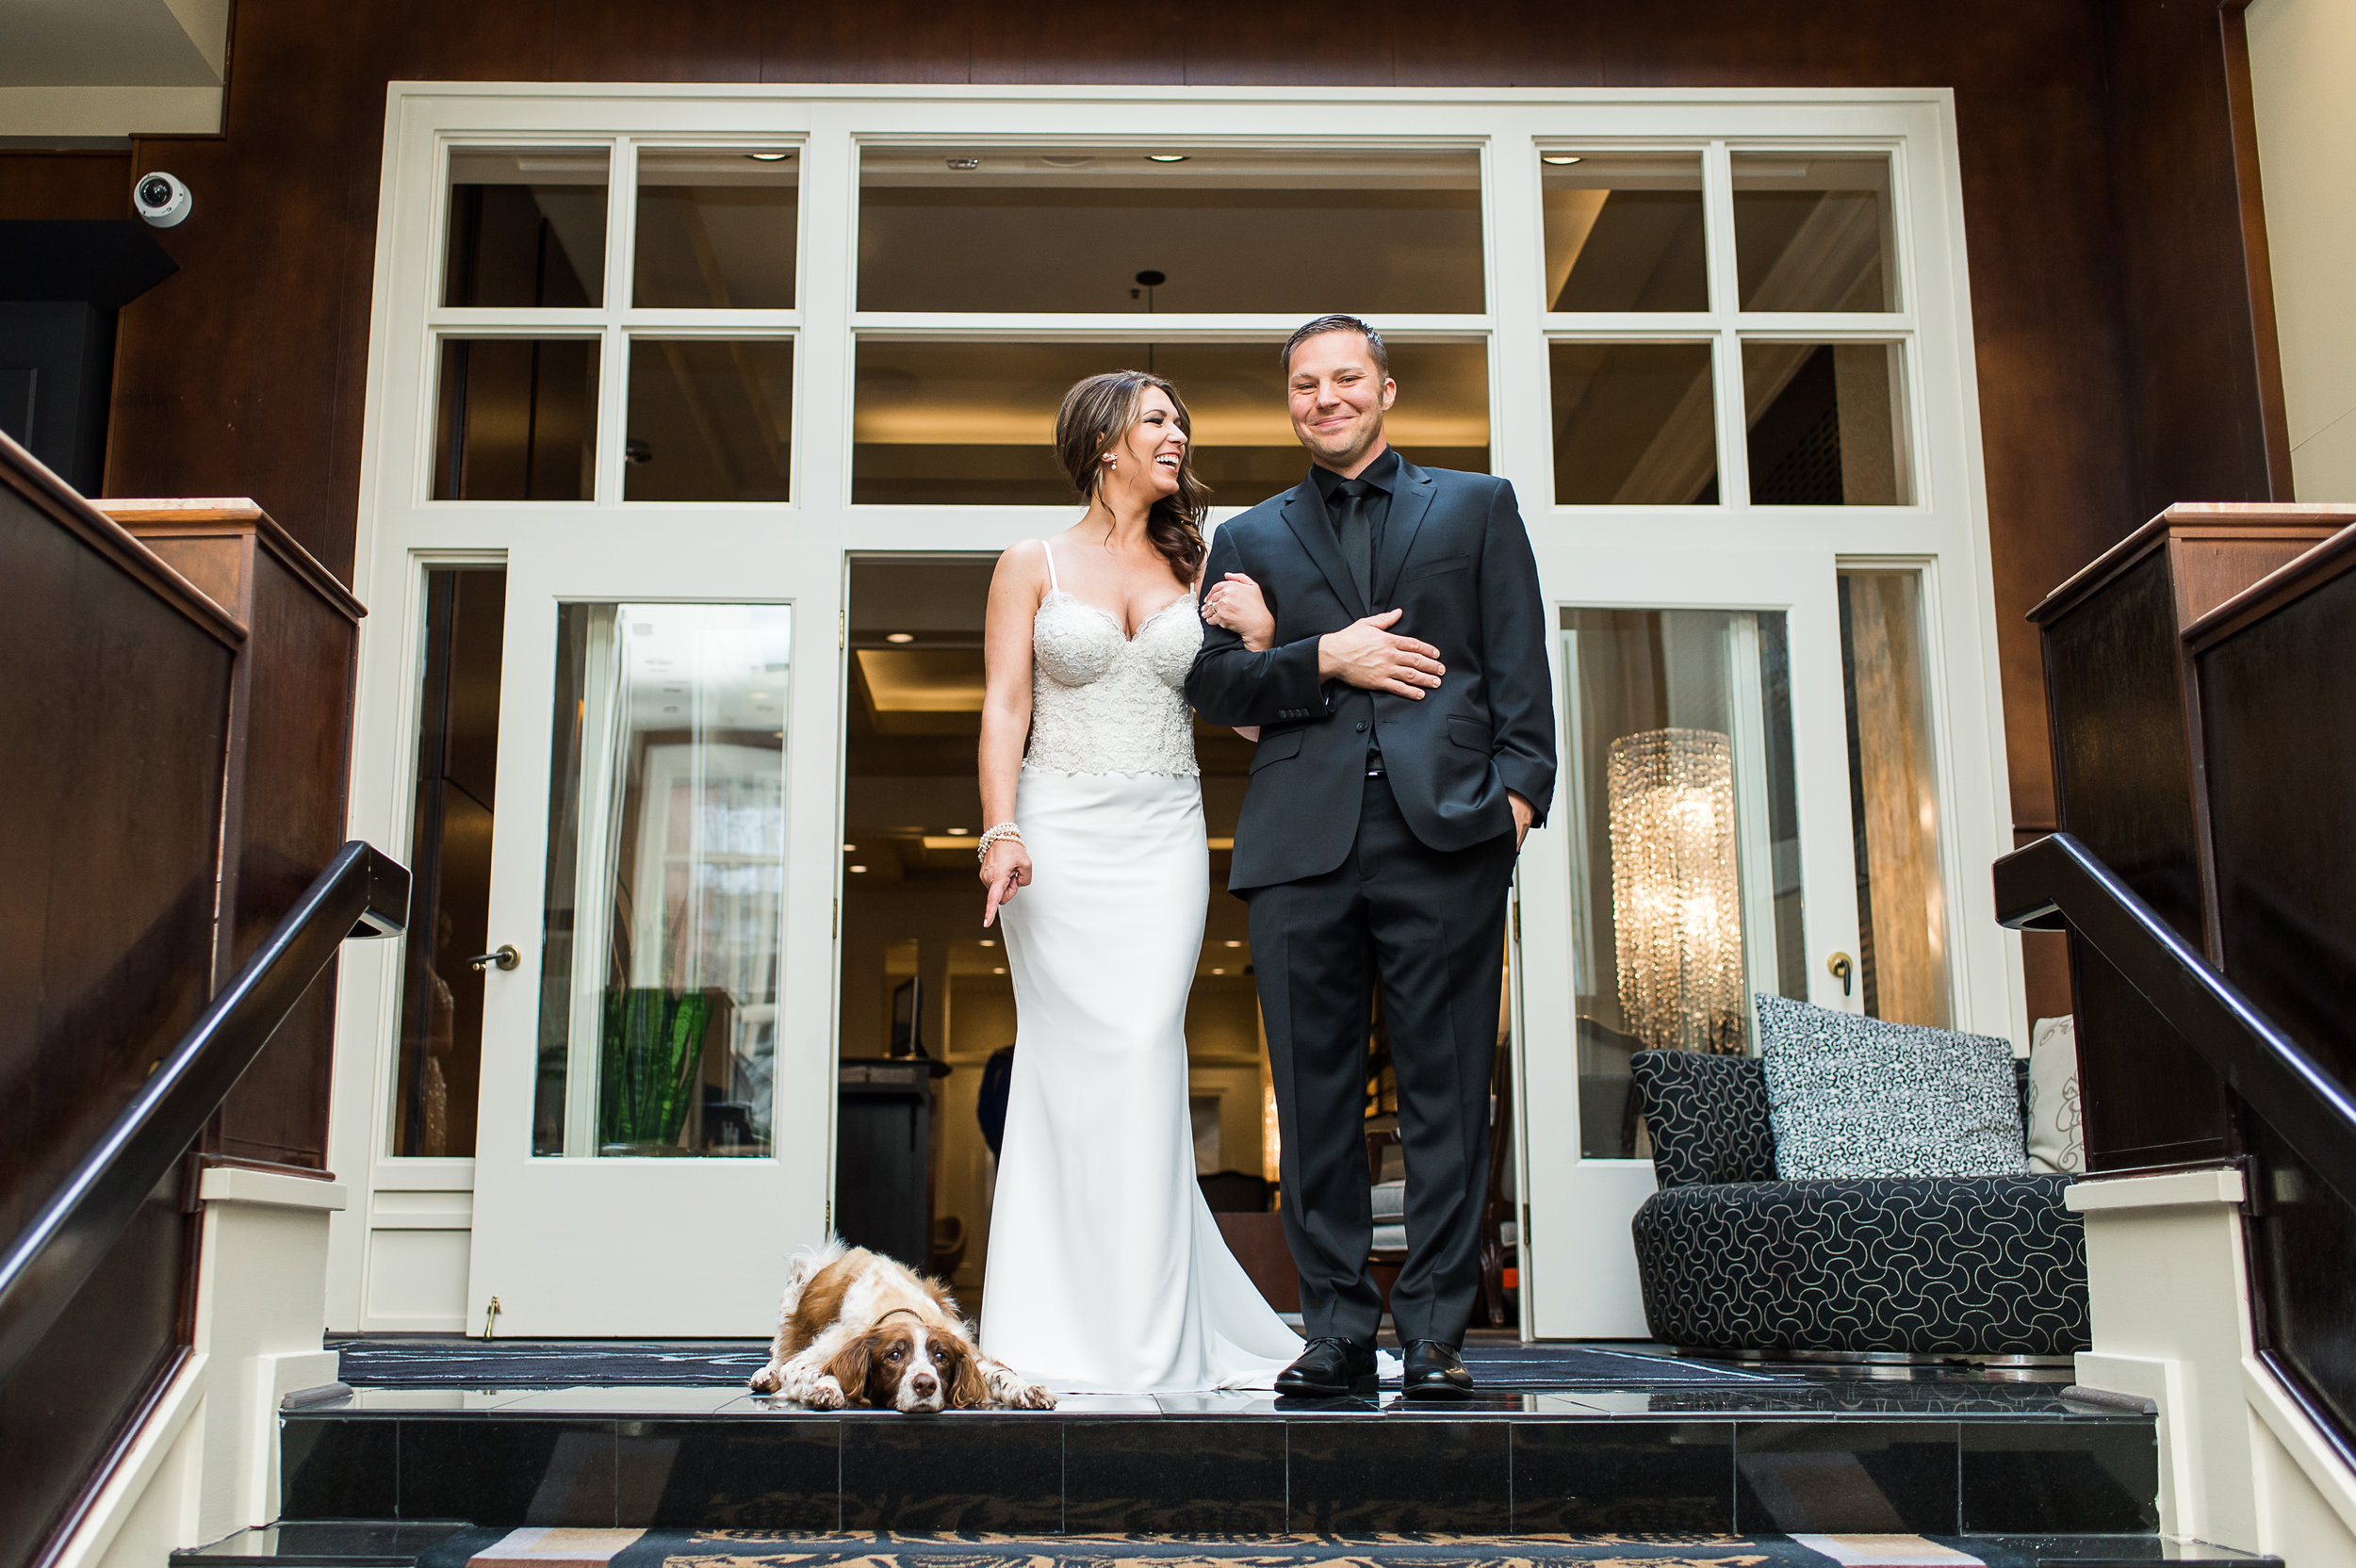 JJ-wedding-Van-Wyhe-Photography-135.jpg